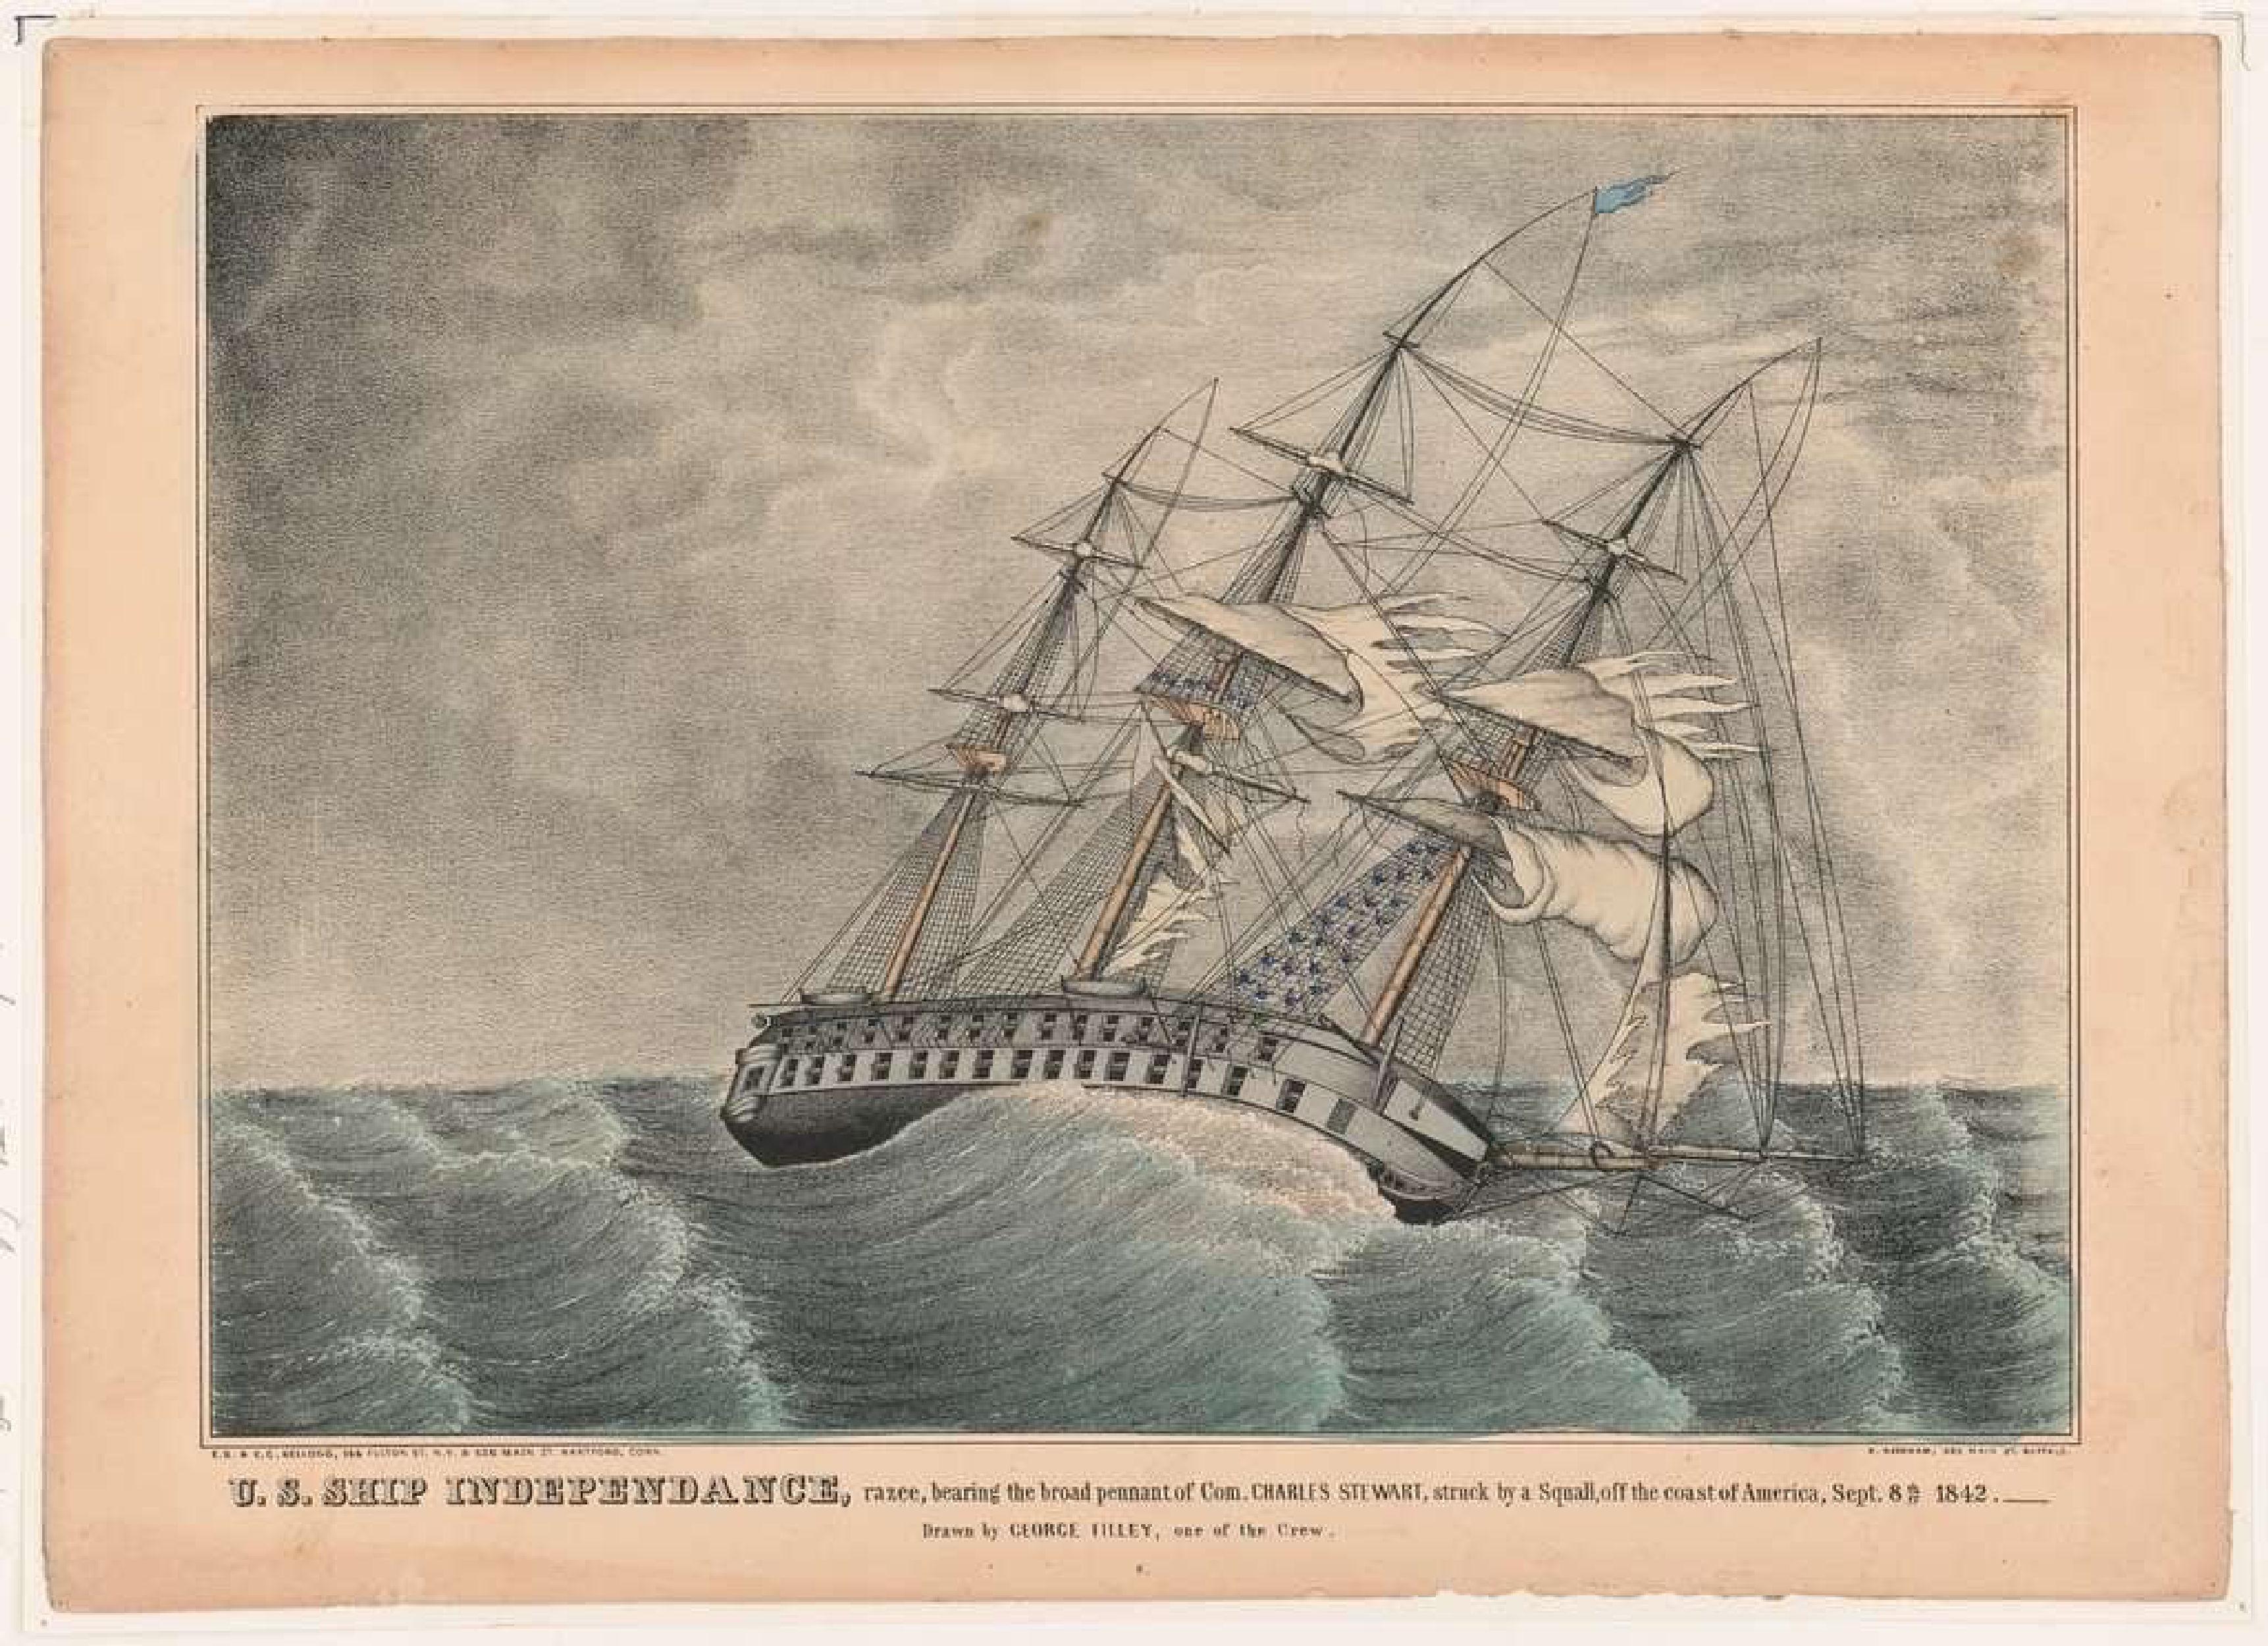 U.S. Ship Independence - lithogr